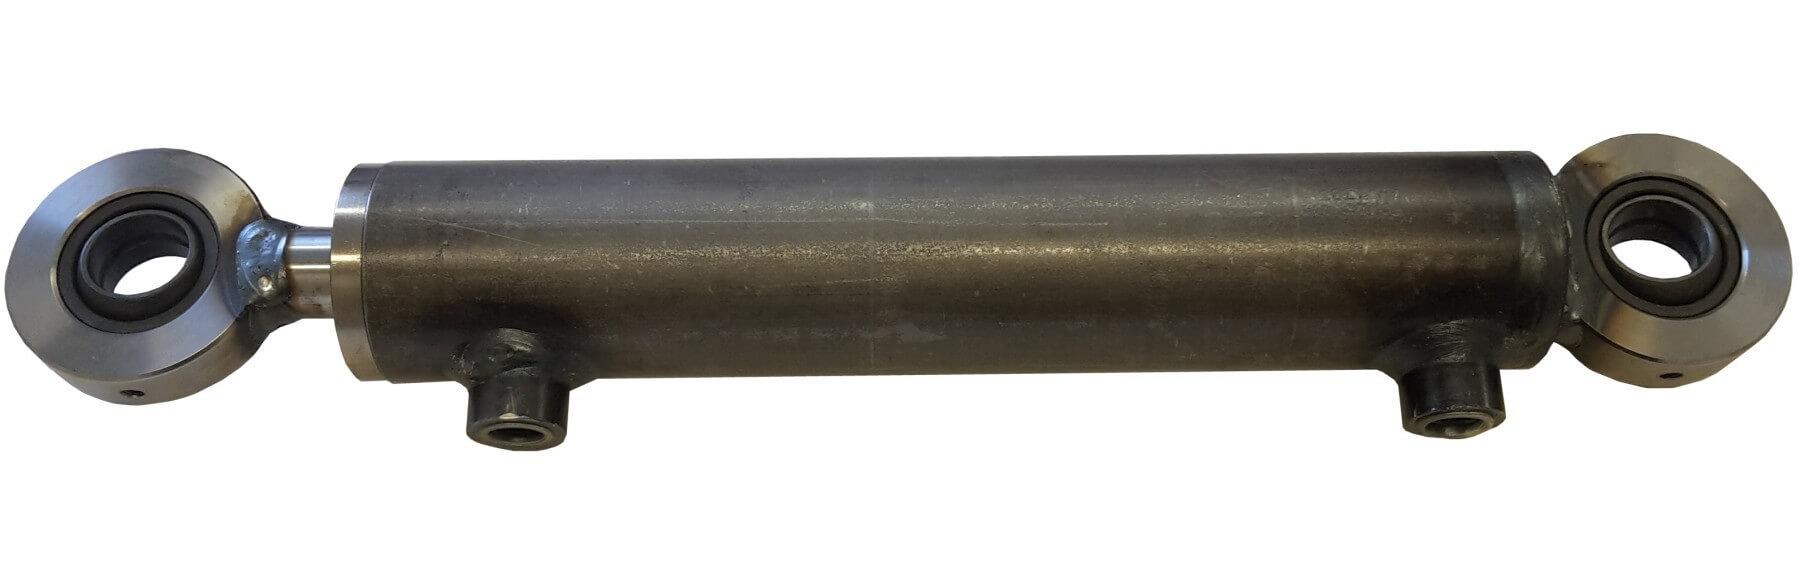 Hydraulisylinteri CL 80. 50. 500 GE